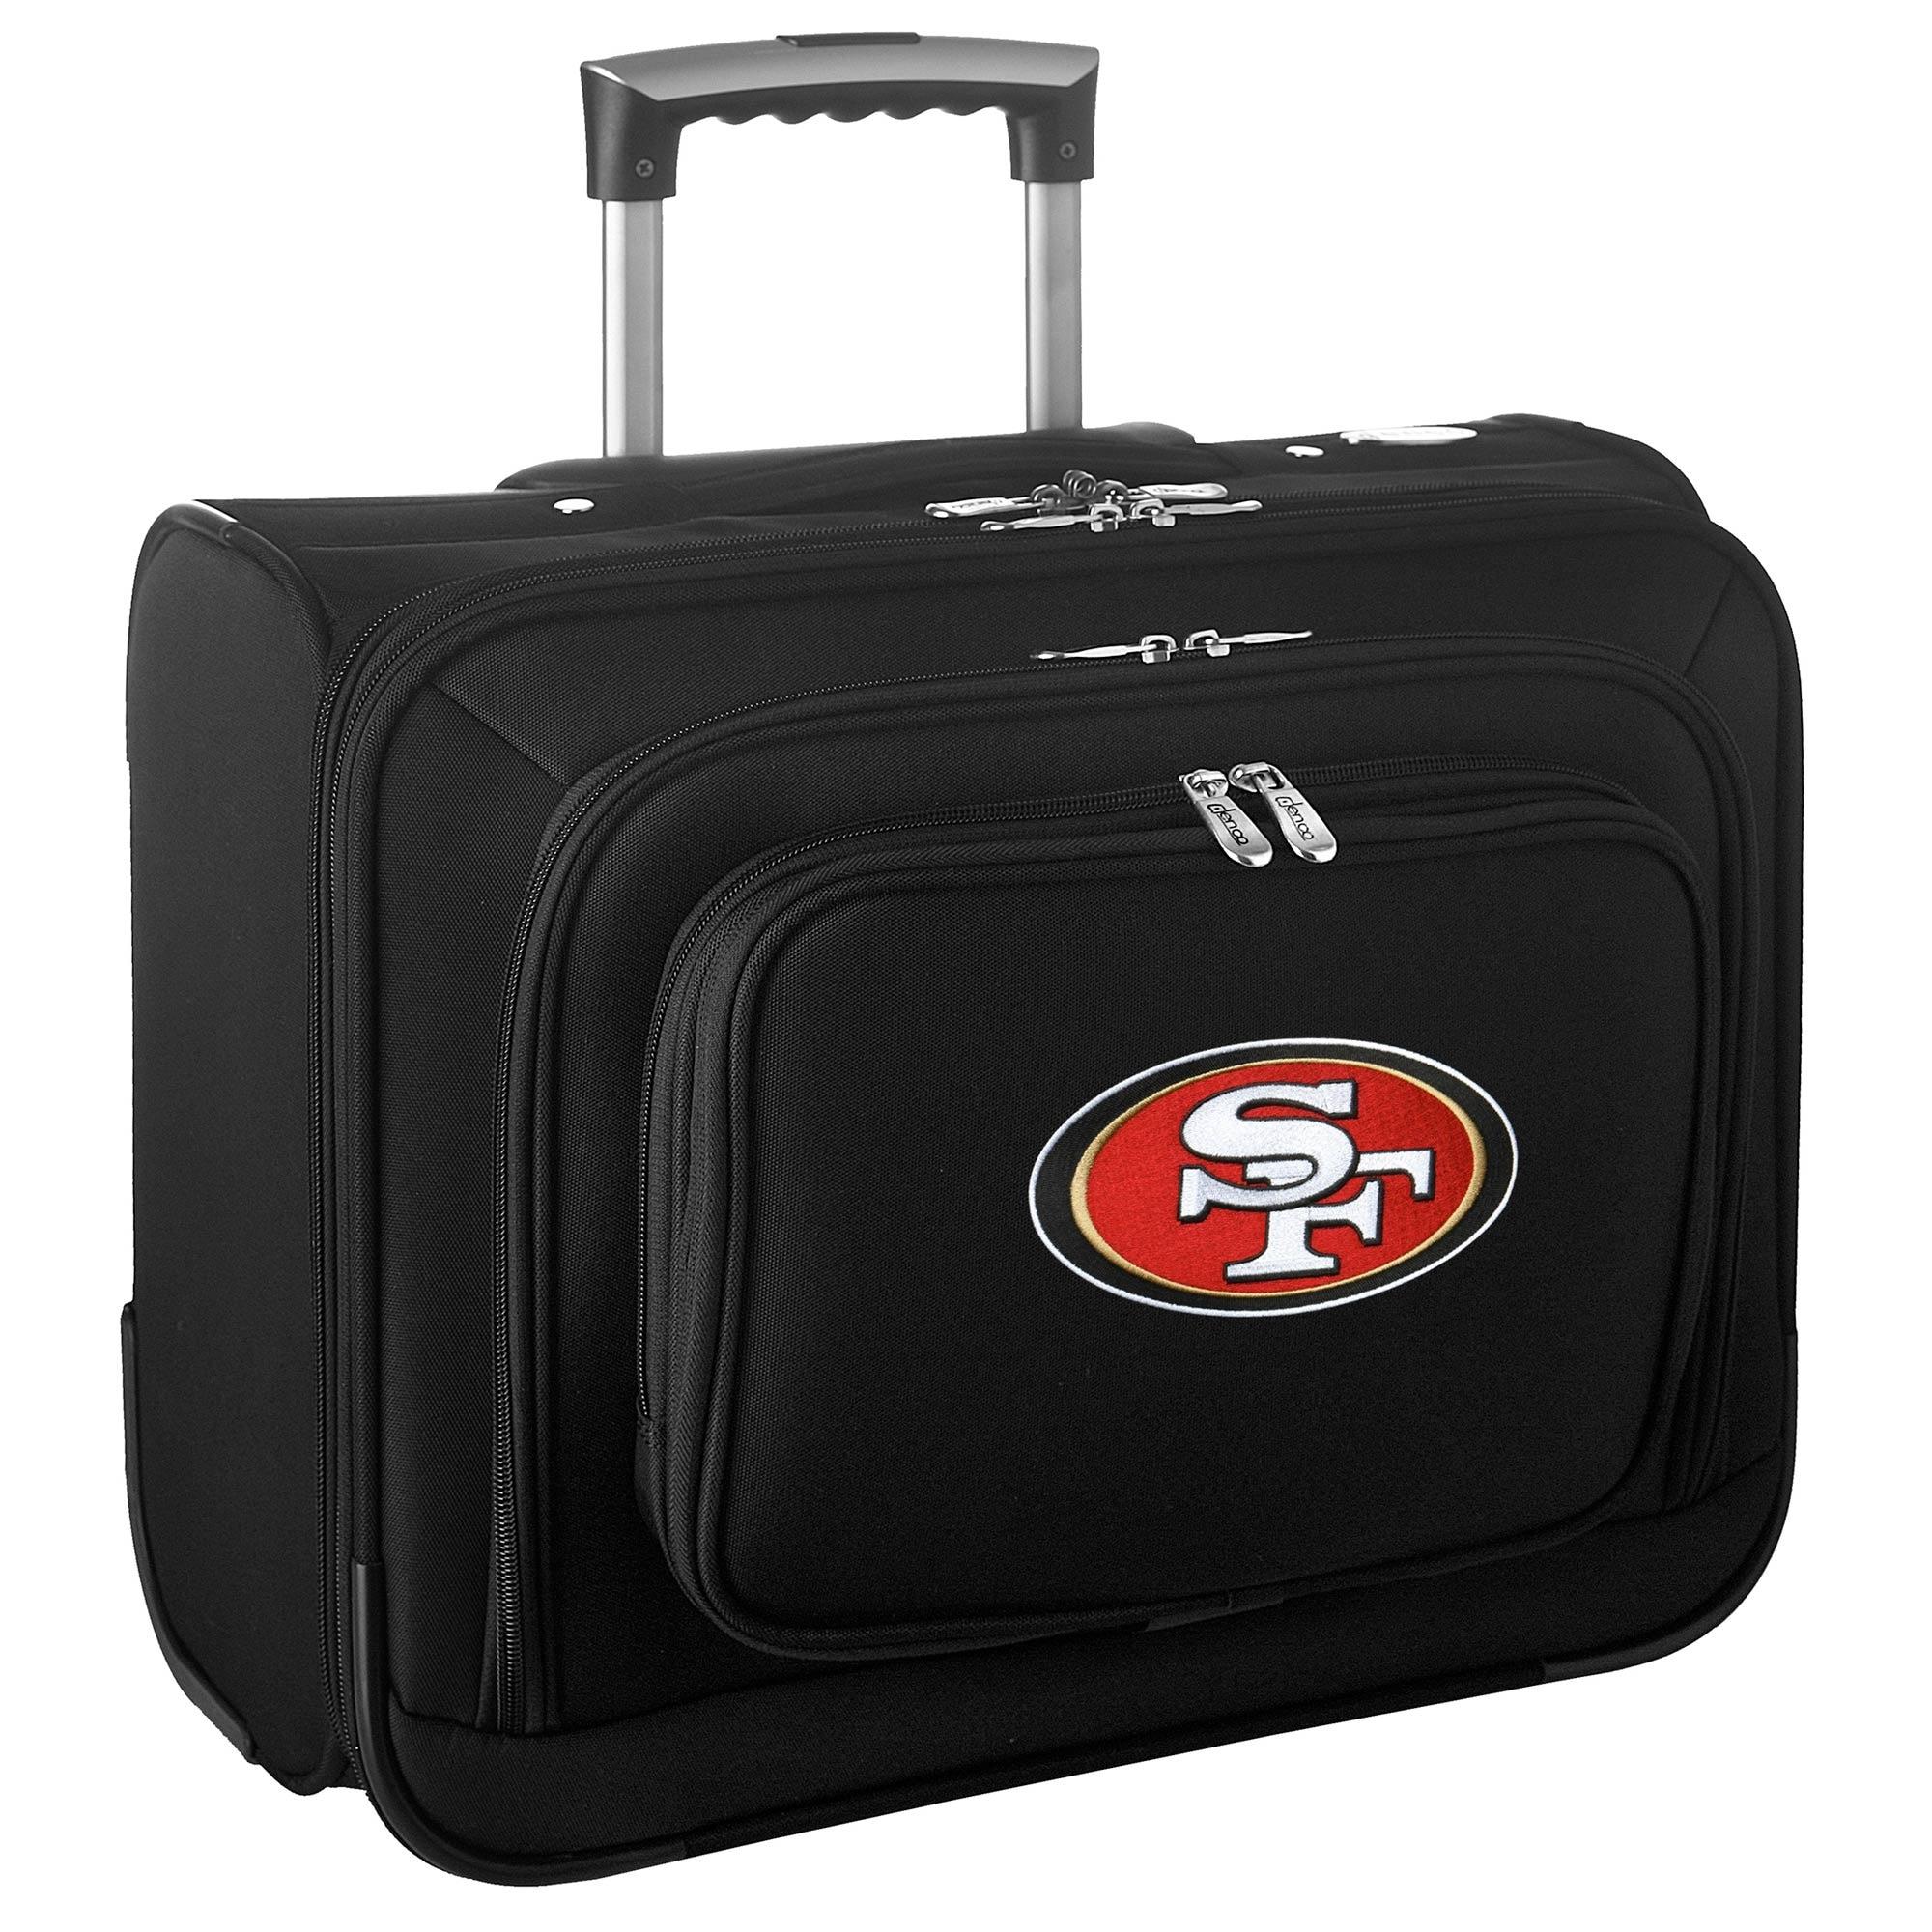 "San Francisco 49ers 14"" 2-Wheeled Laptop Overnighter Travel Case - Black"